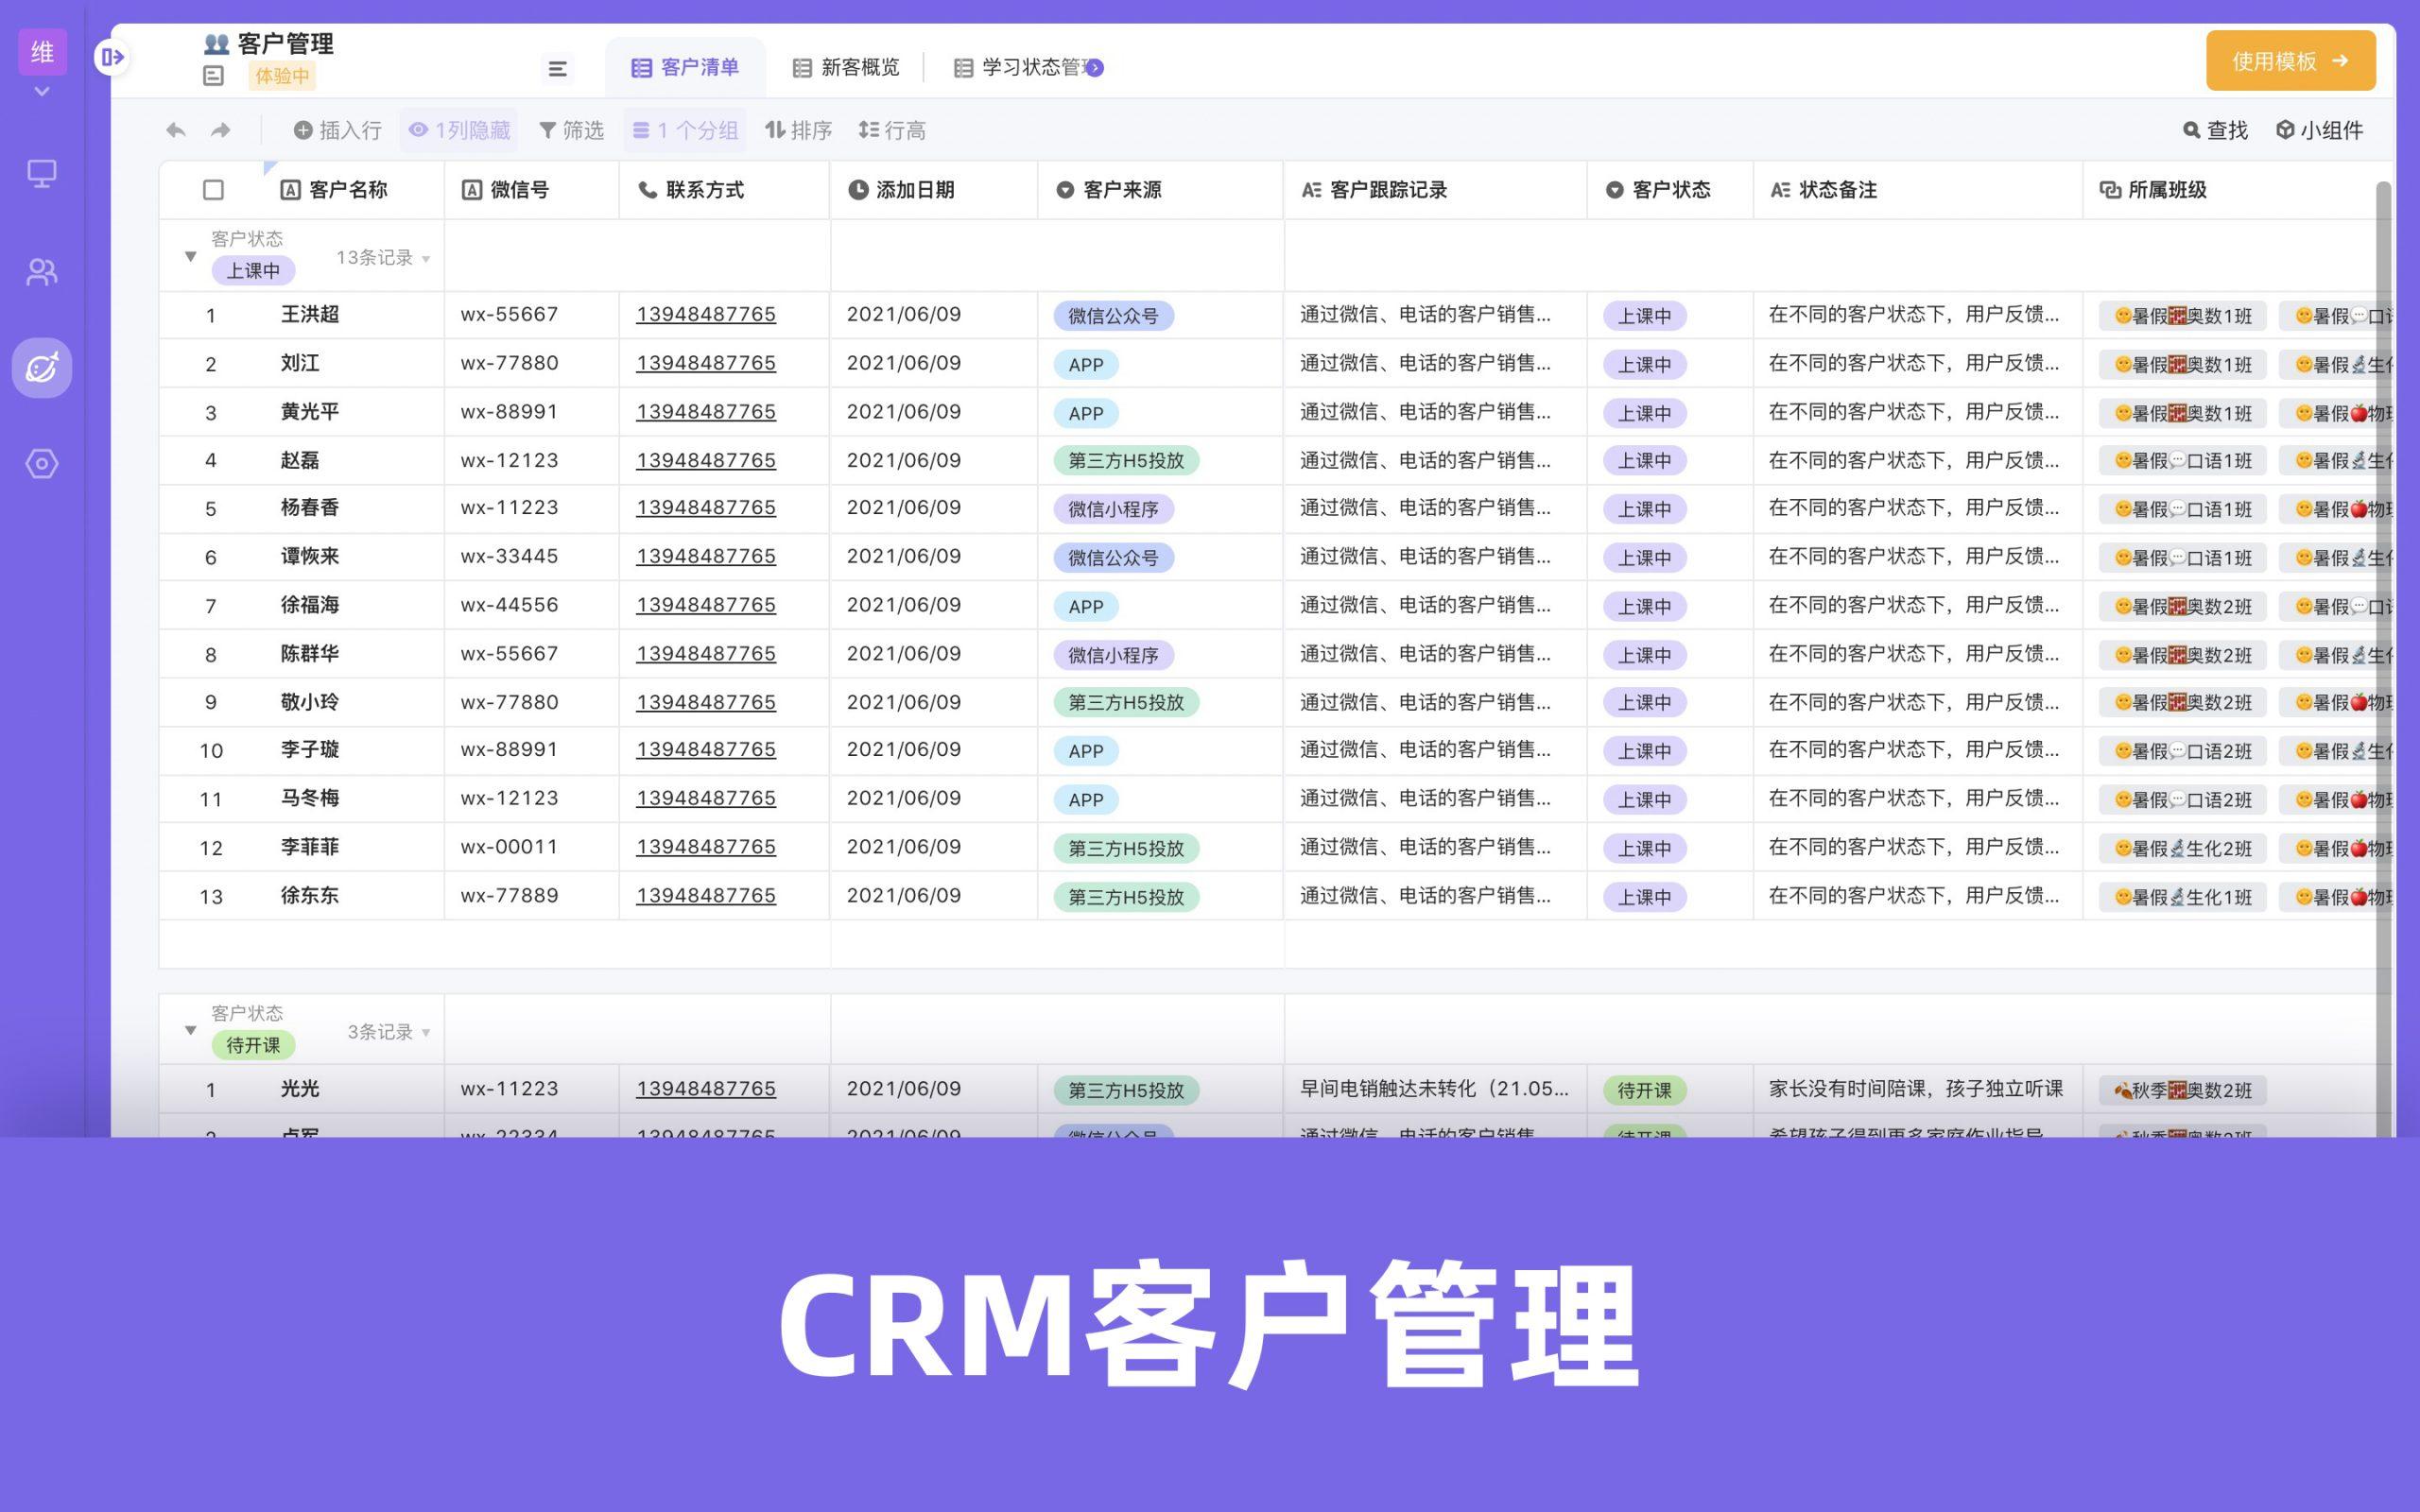 JP模板-CRM客户管理